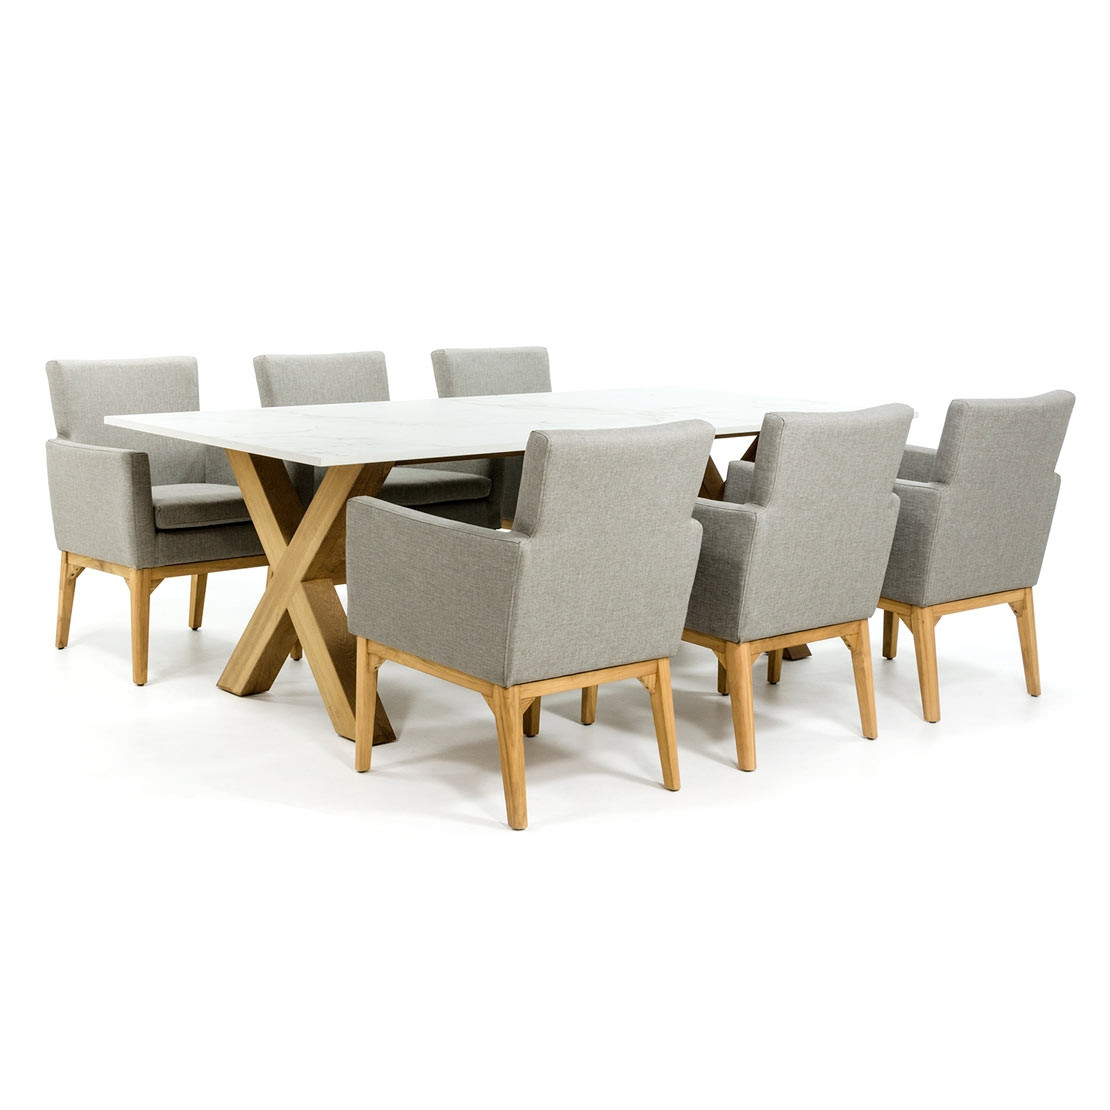 Dekton tafelblad met houten kruispoot onderstel